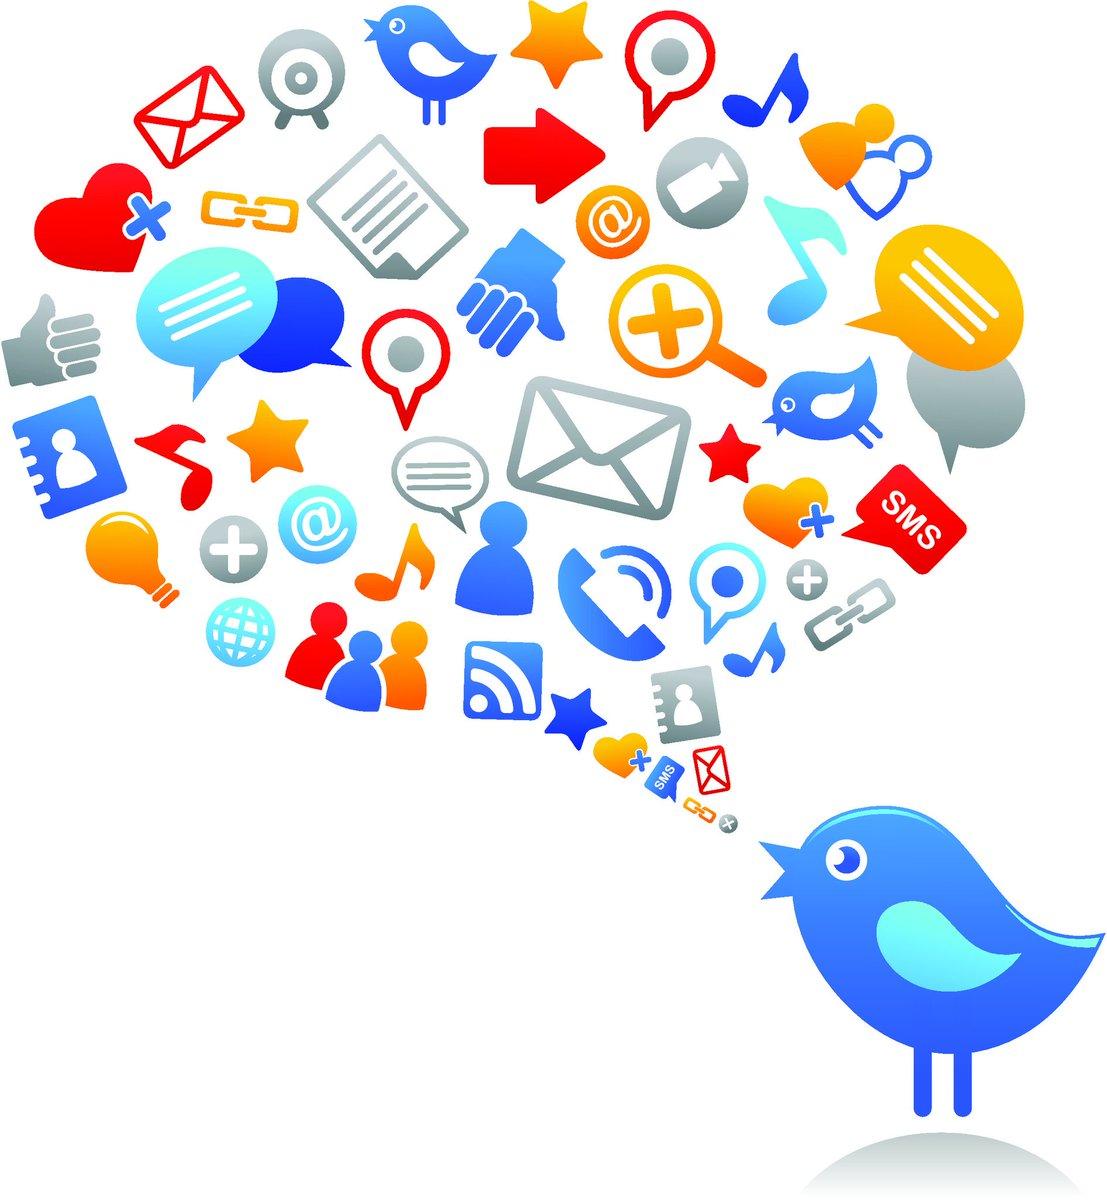 .@OracleSocial explores the symbiotic relationship between #BigData and #SocialMedia